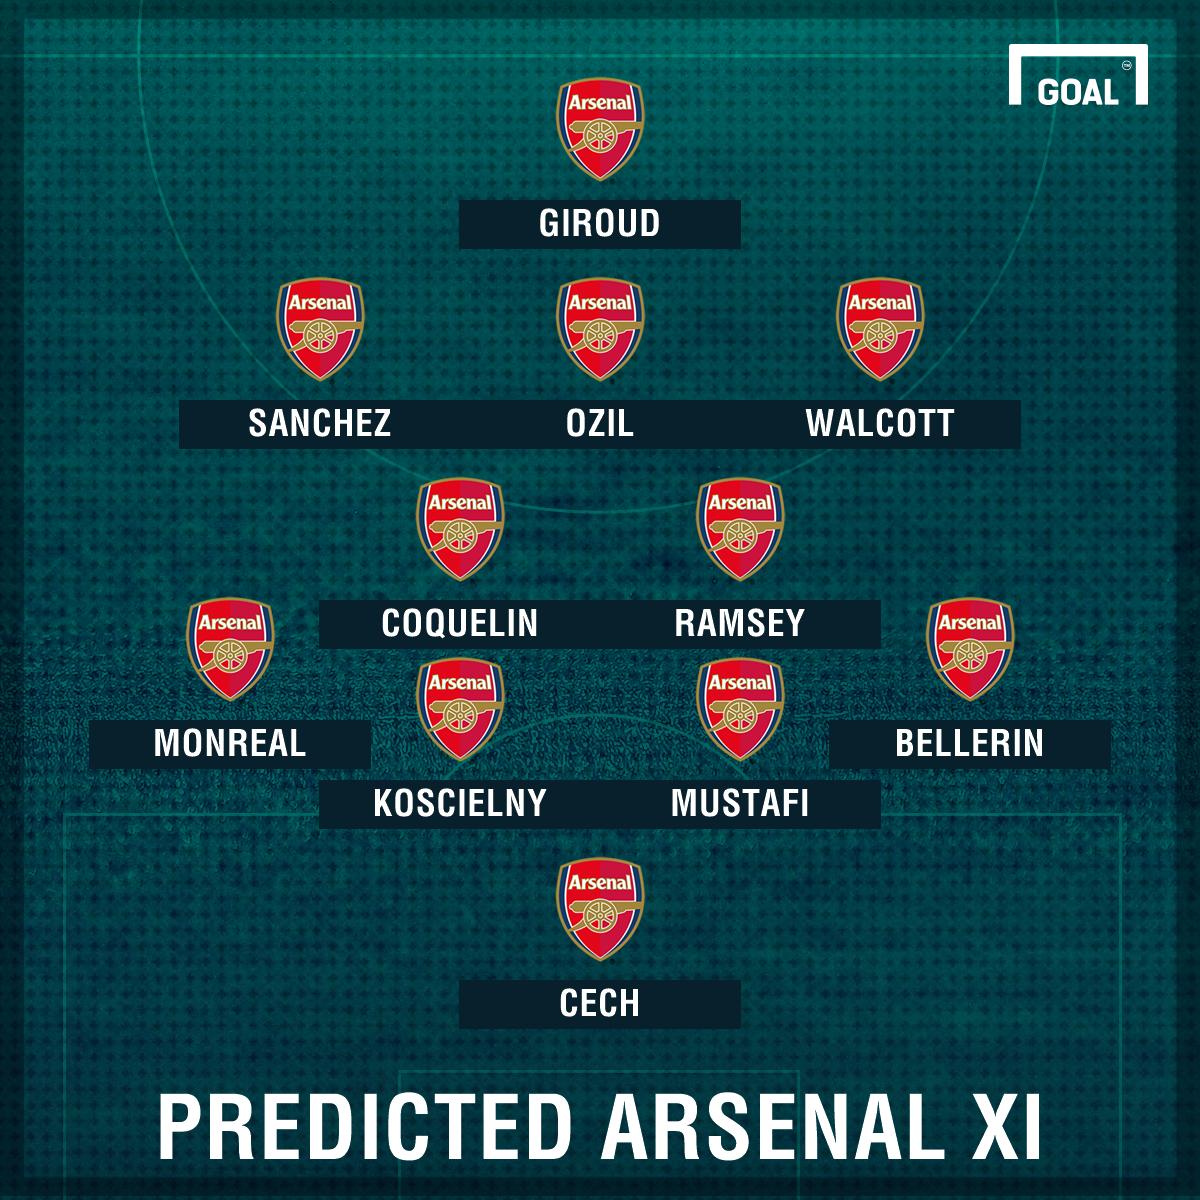 Predicted XI Arsenal